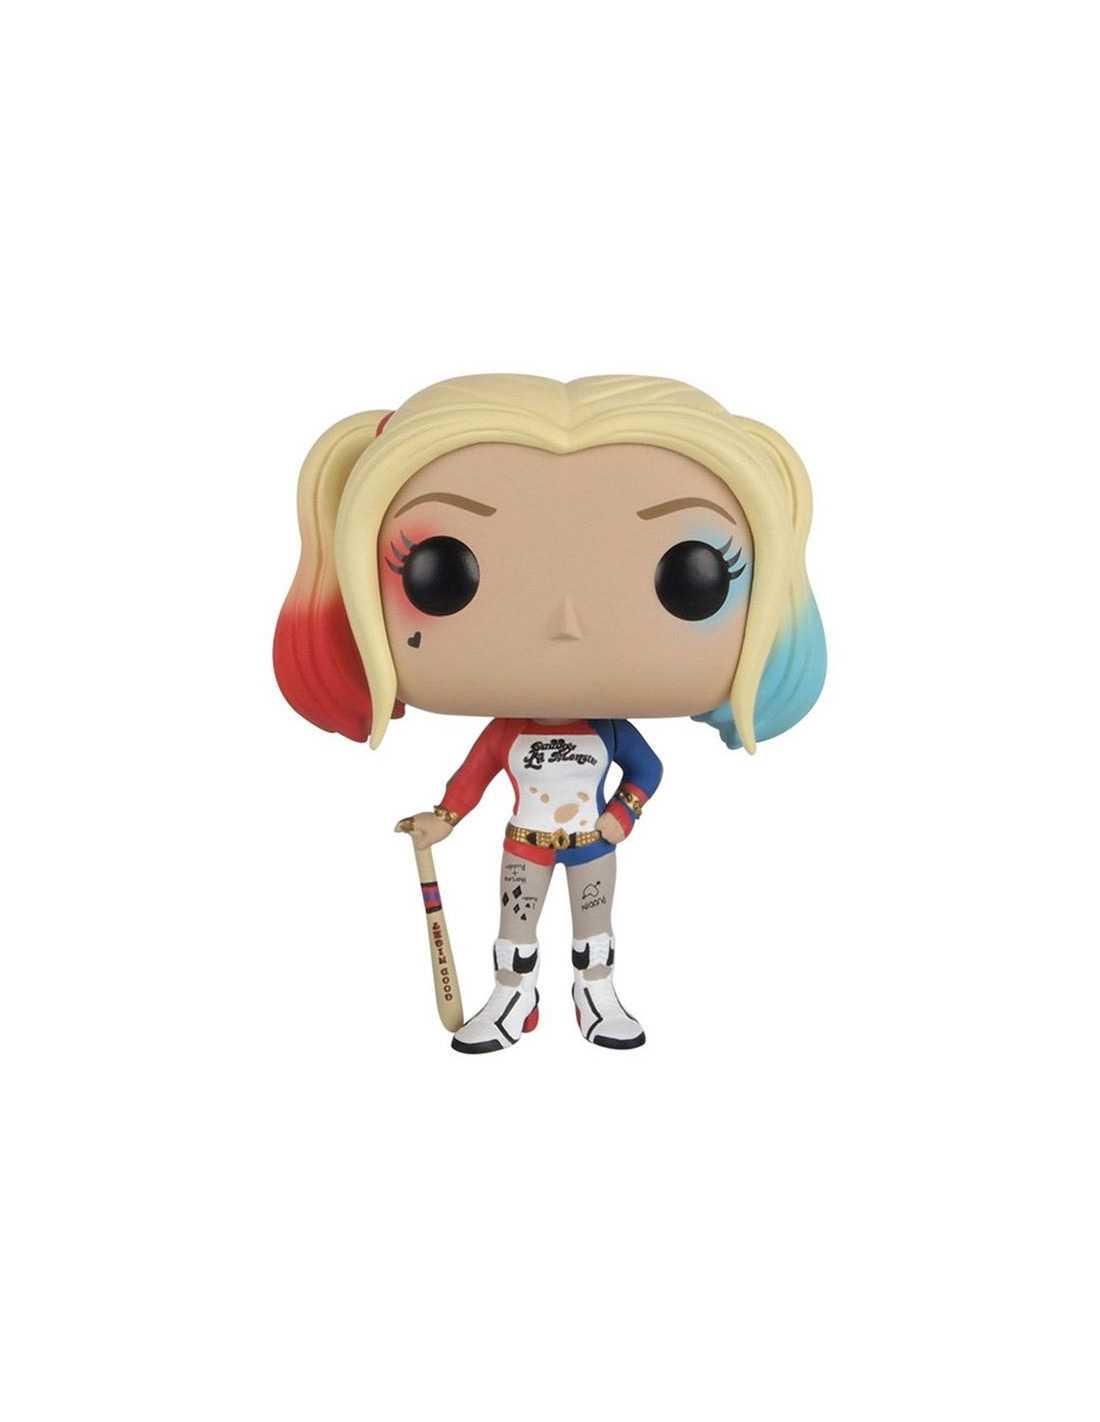 Фигурка Funko POP Harley Quinn (с большой головой)